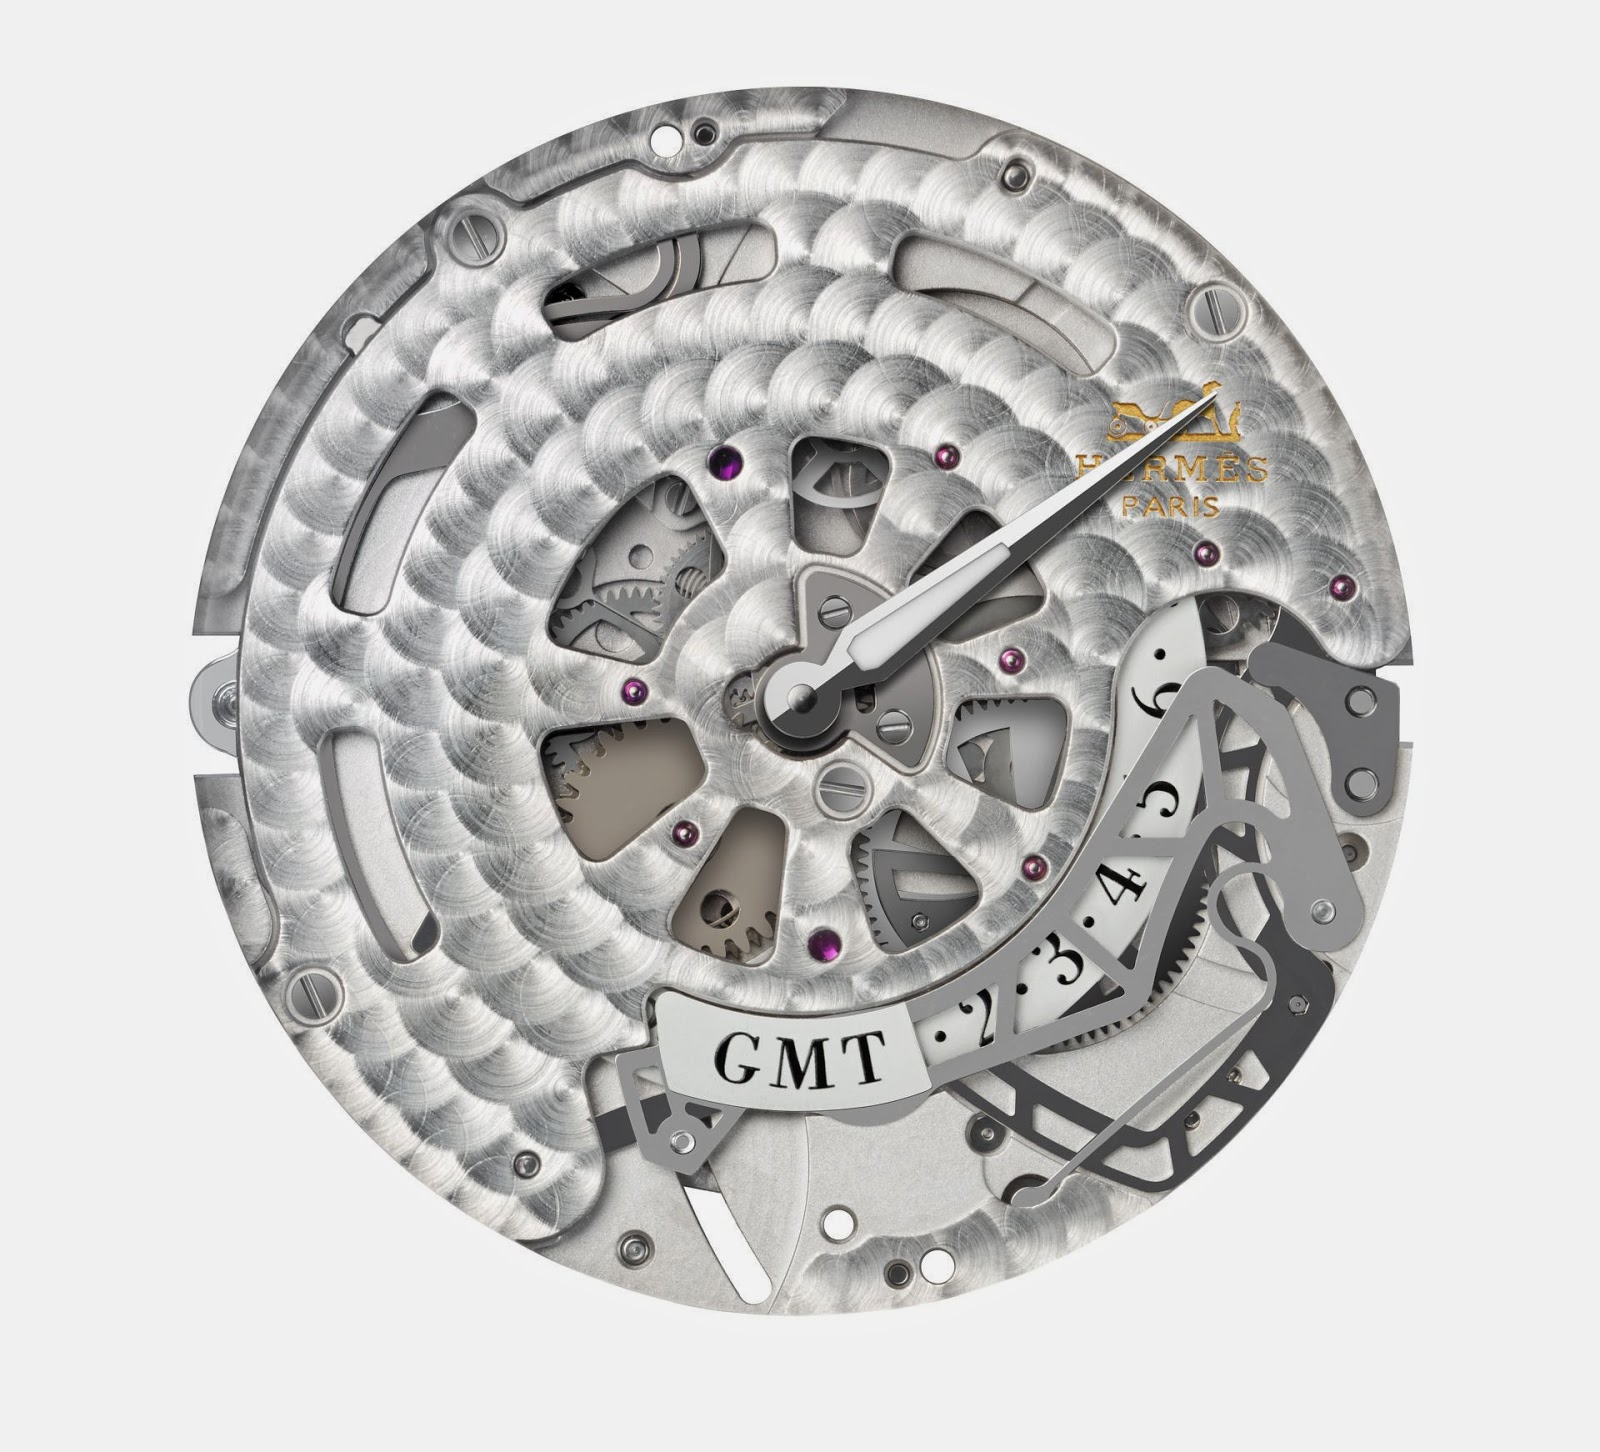 Hermès mechanical self-winding movement H1925